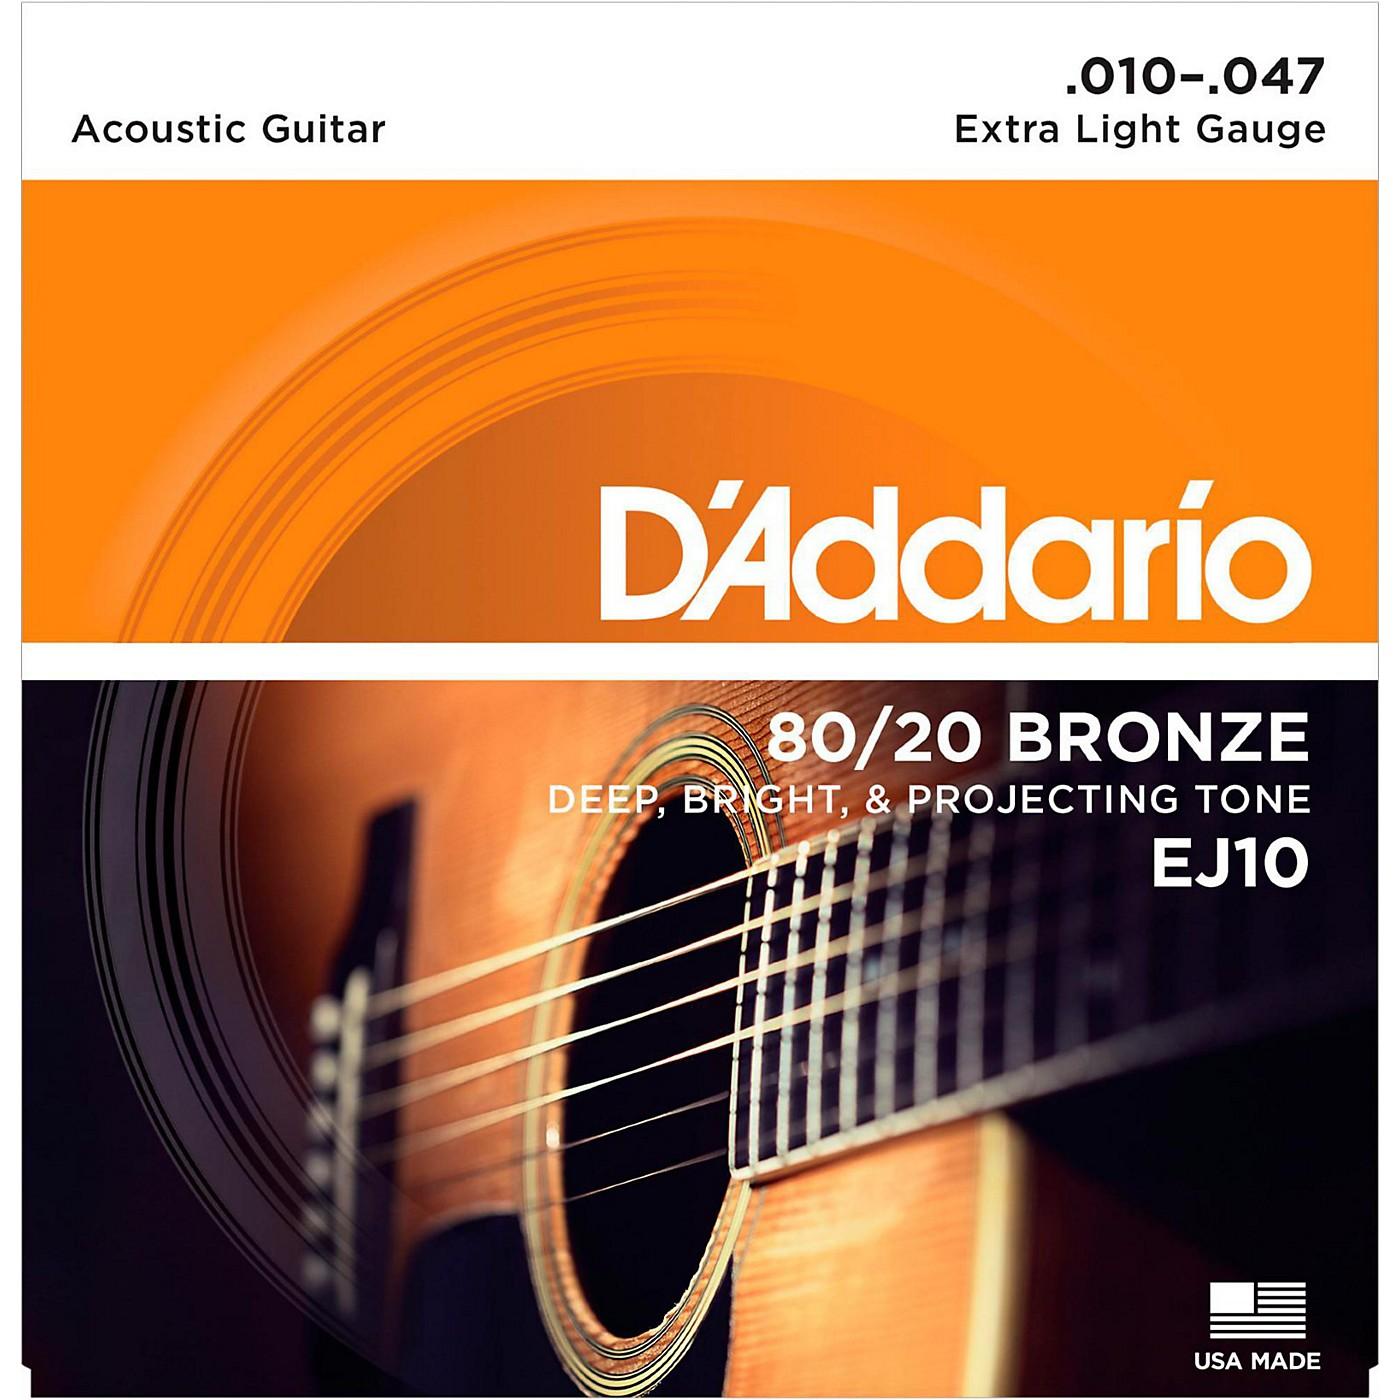 D'Addario EJ10 80/20 Bronze Extra Light Acoustic Guitar Strings thumbnail